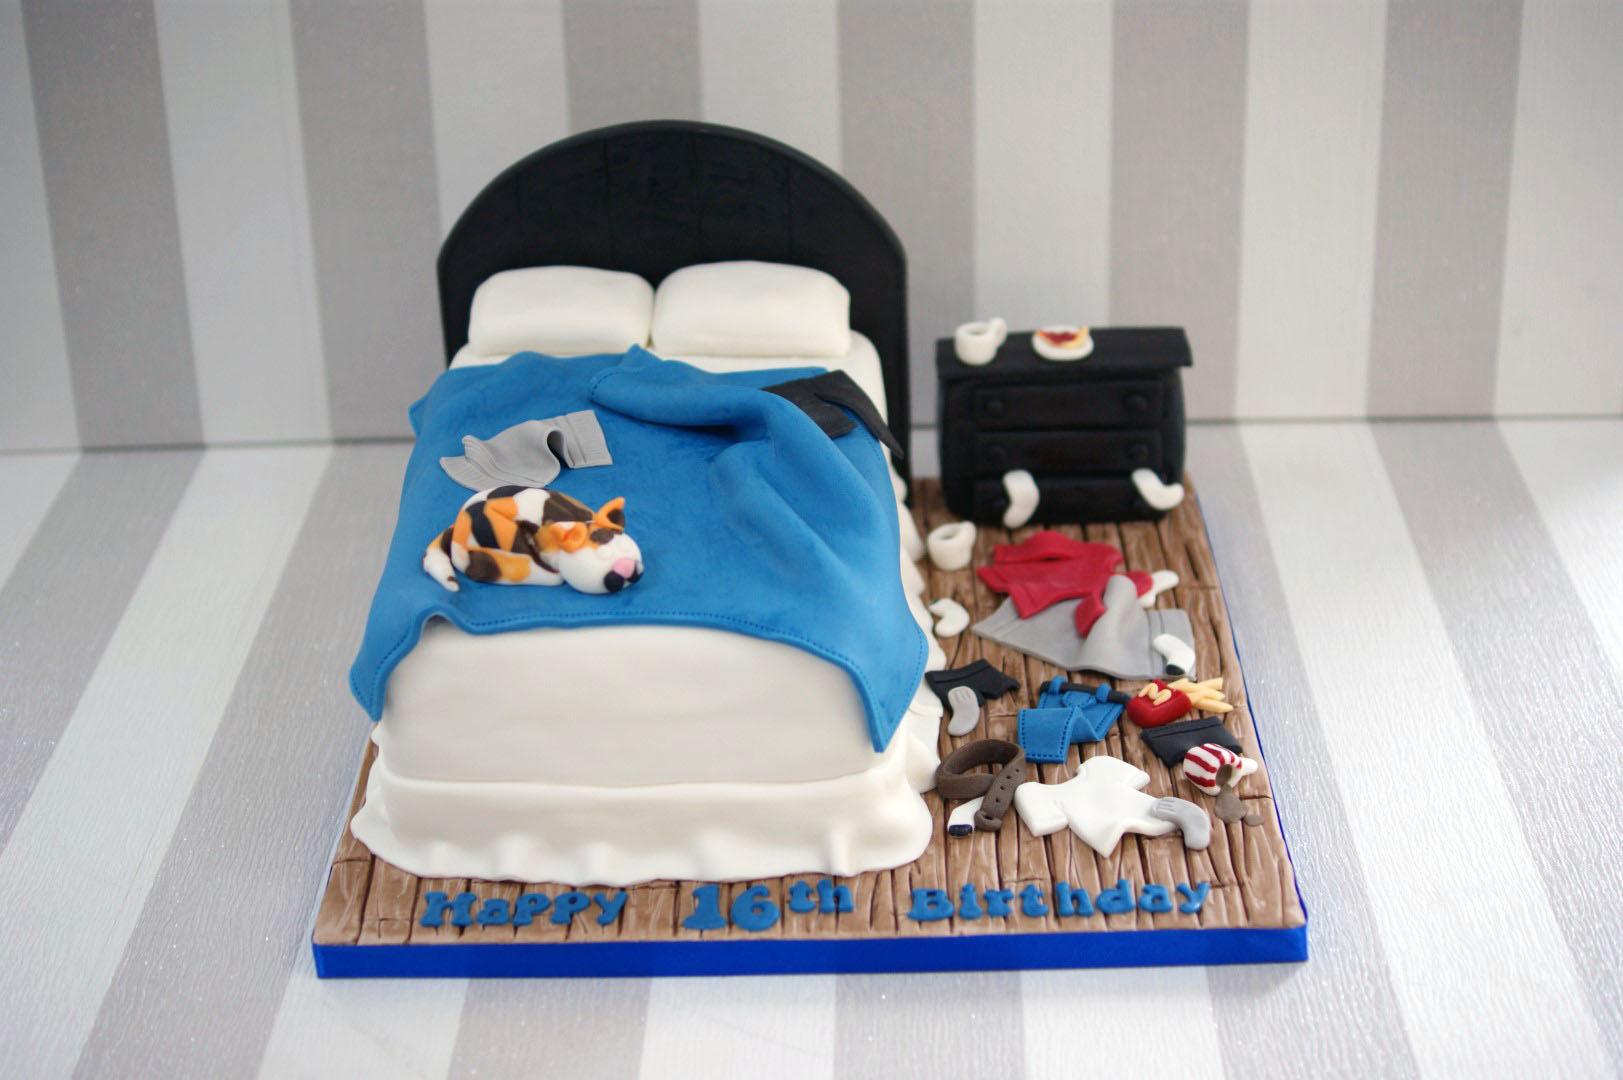 Disney Bedroom Decor Messy Bedroom Cake Bakealous